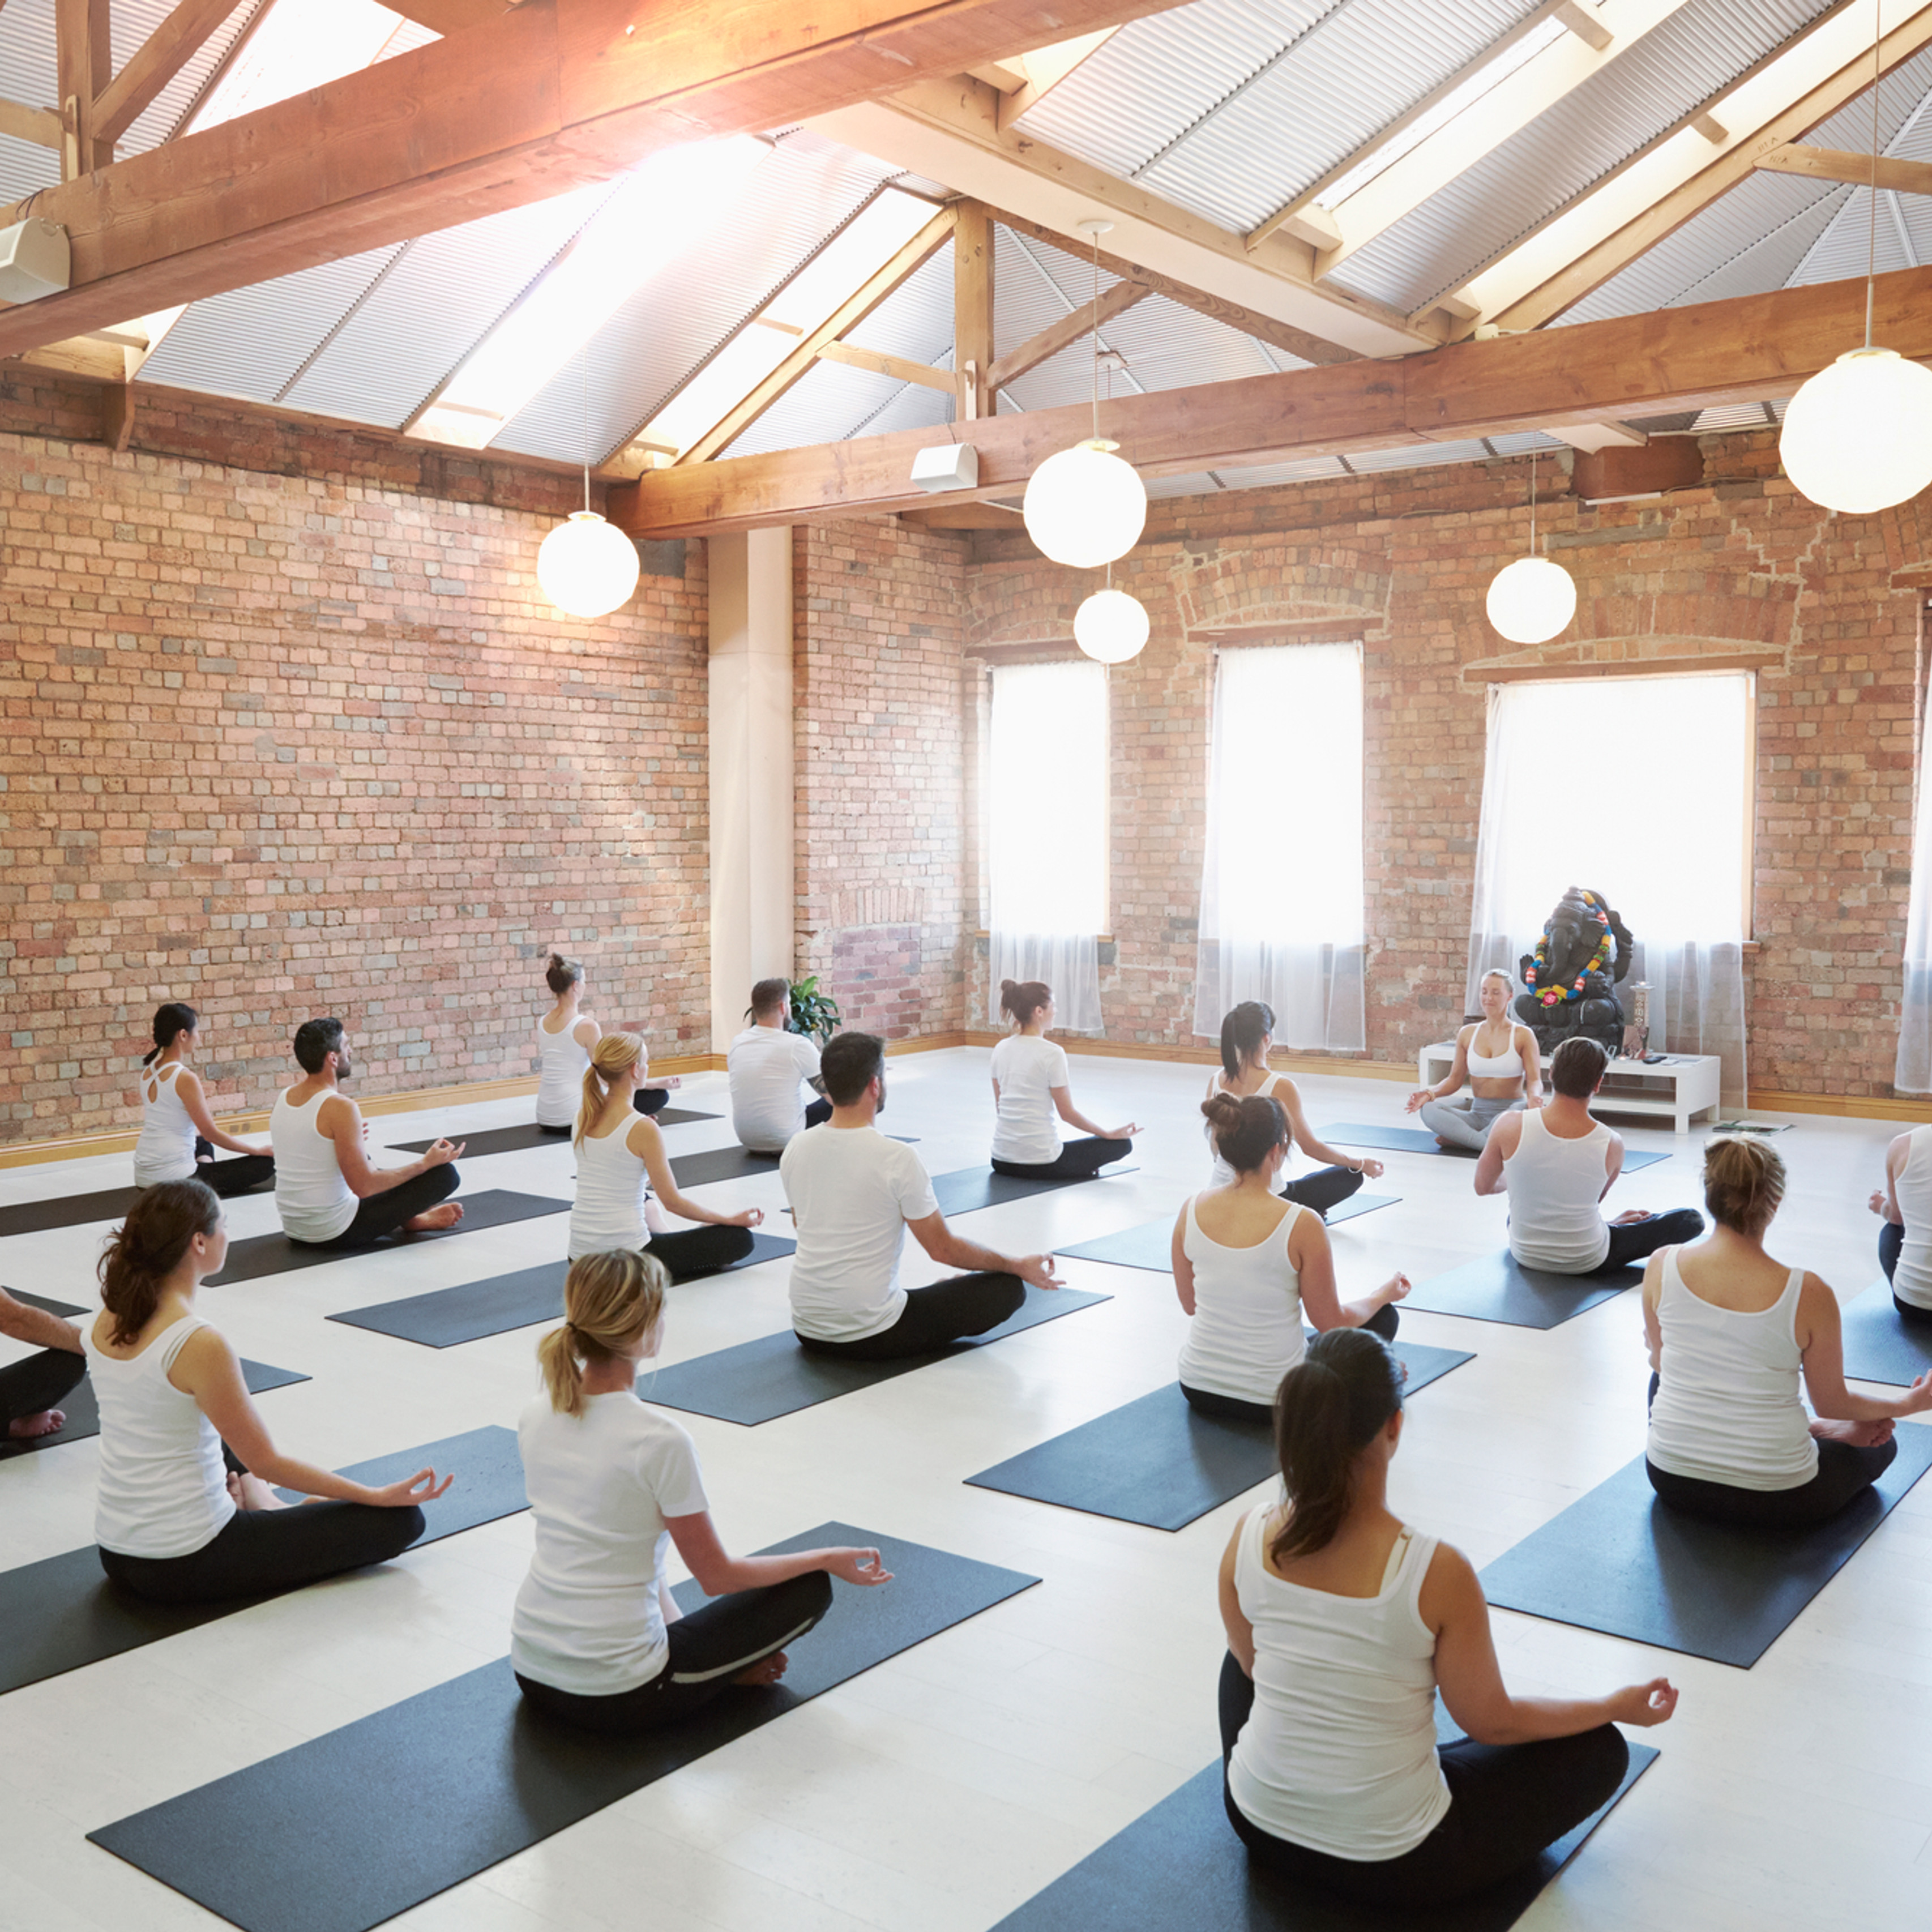 Team Building Yoga Session